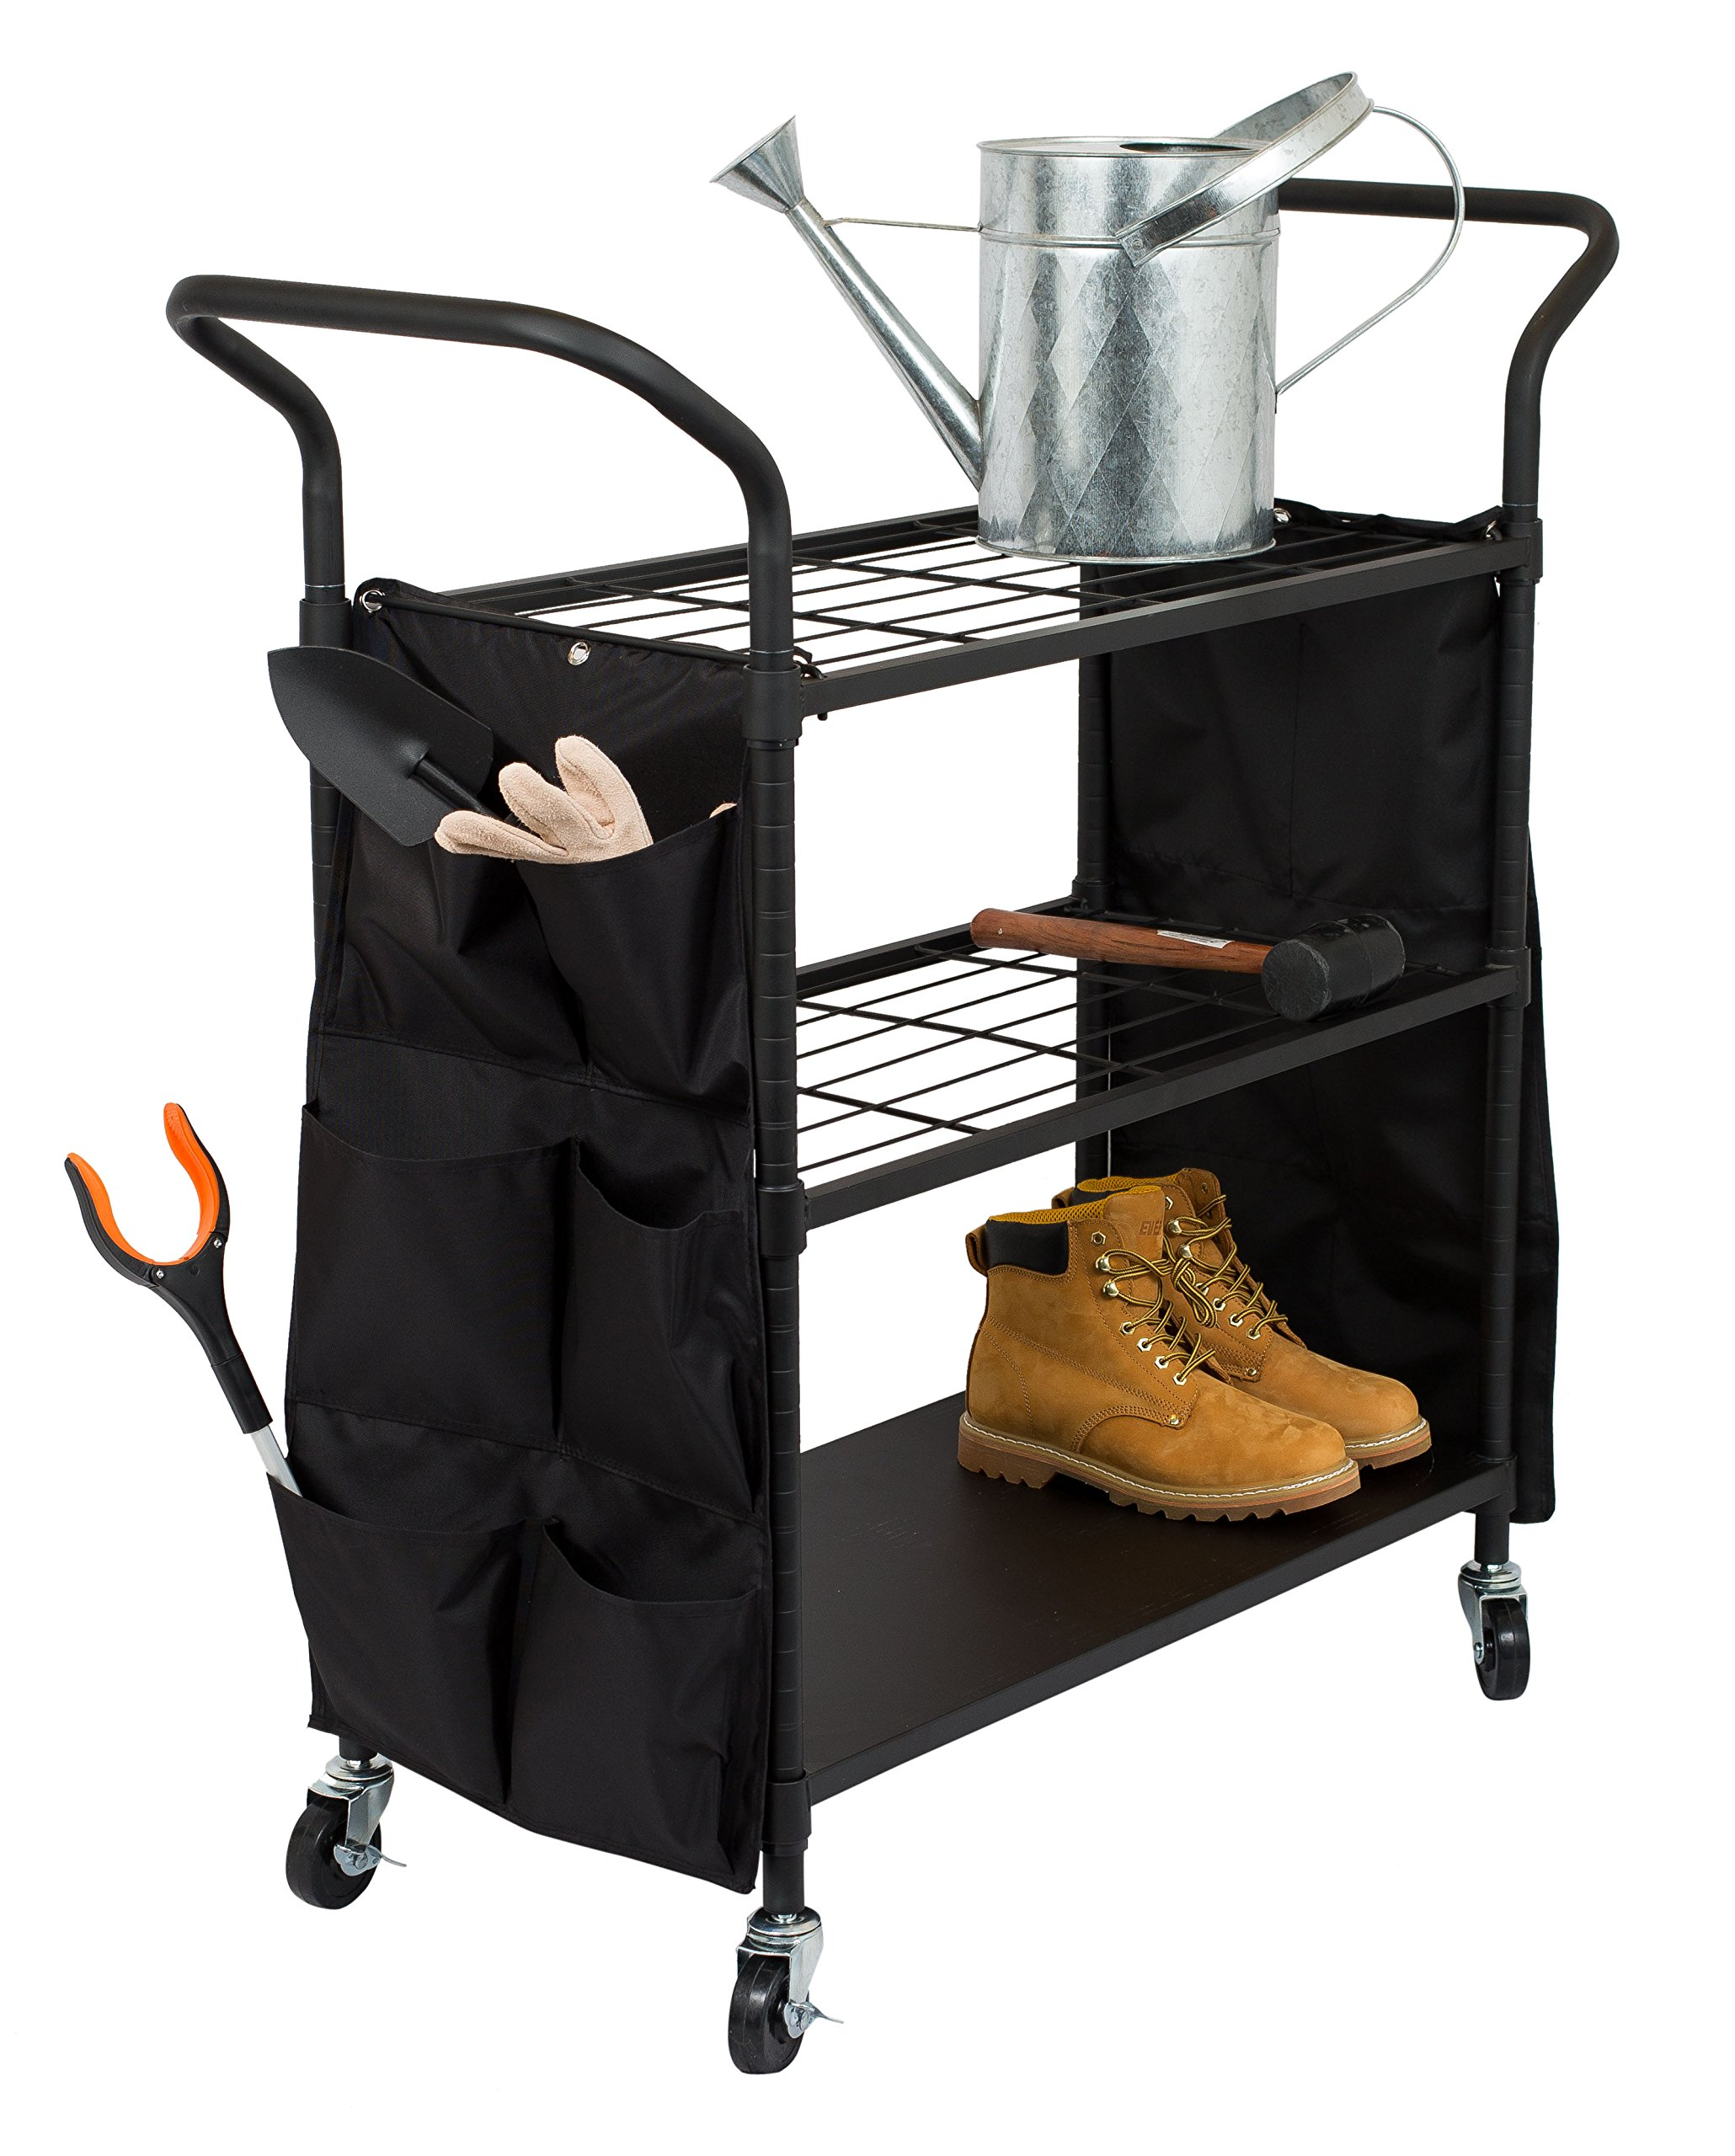 all cart rakuten garden terrain wagon shop shopping choice beach utility folding w bestchoiceproducts product wheels best products